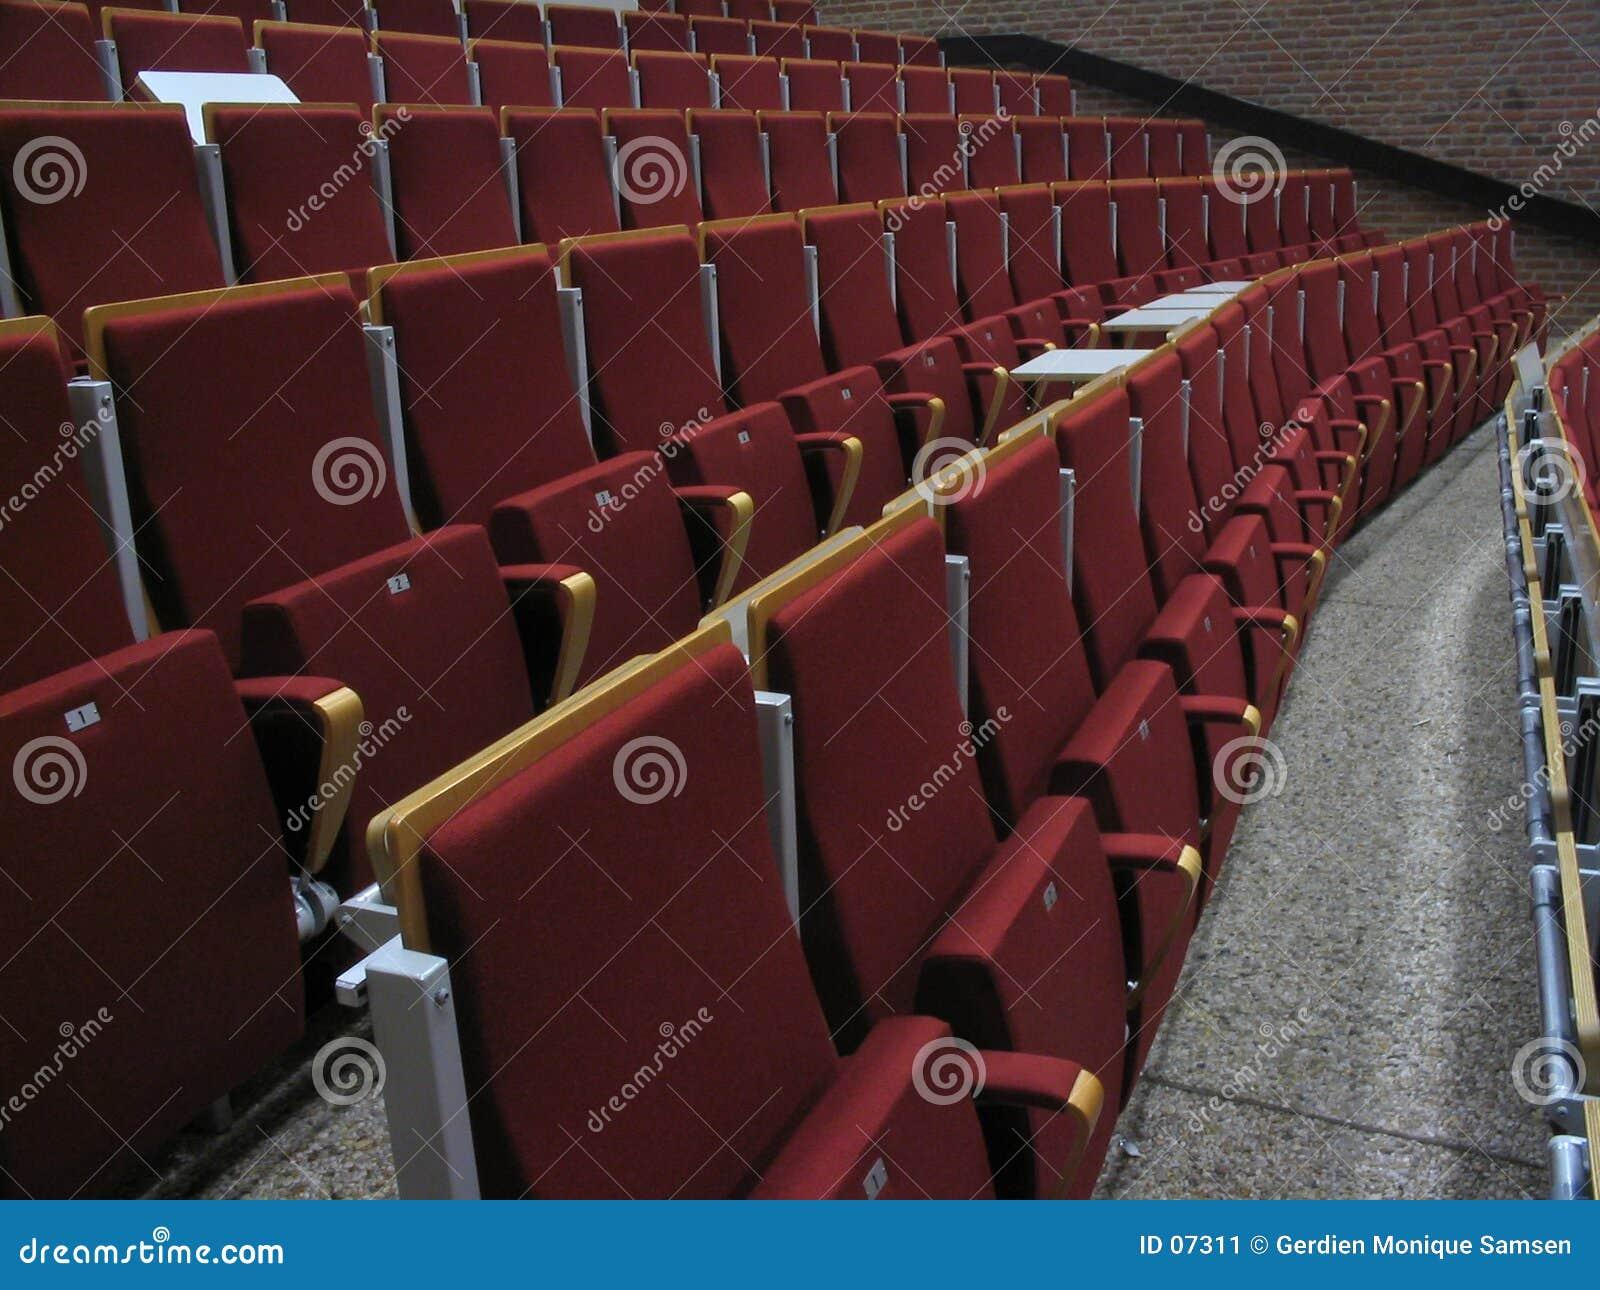 College Theatre IV